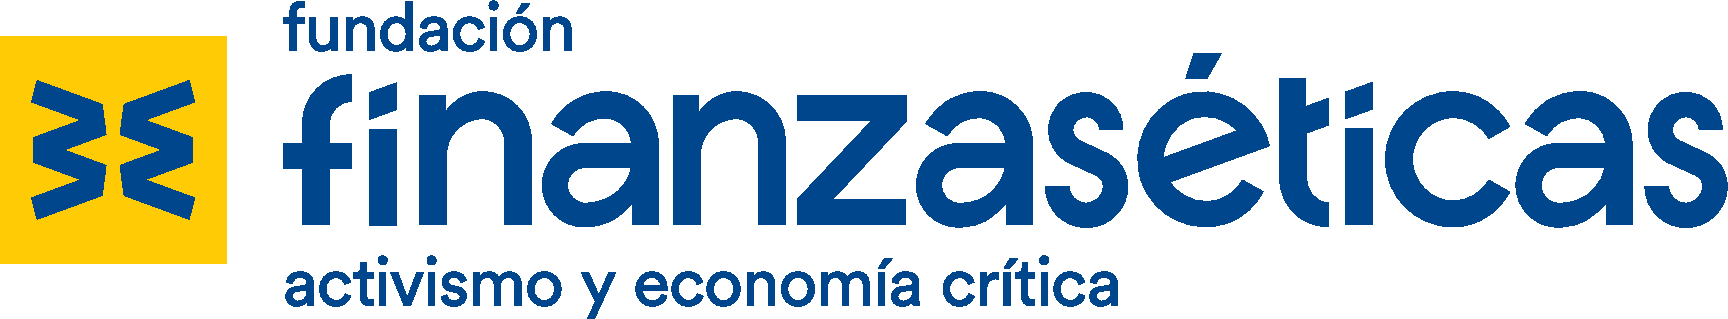 Fundación Finanzas Éticas